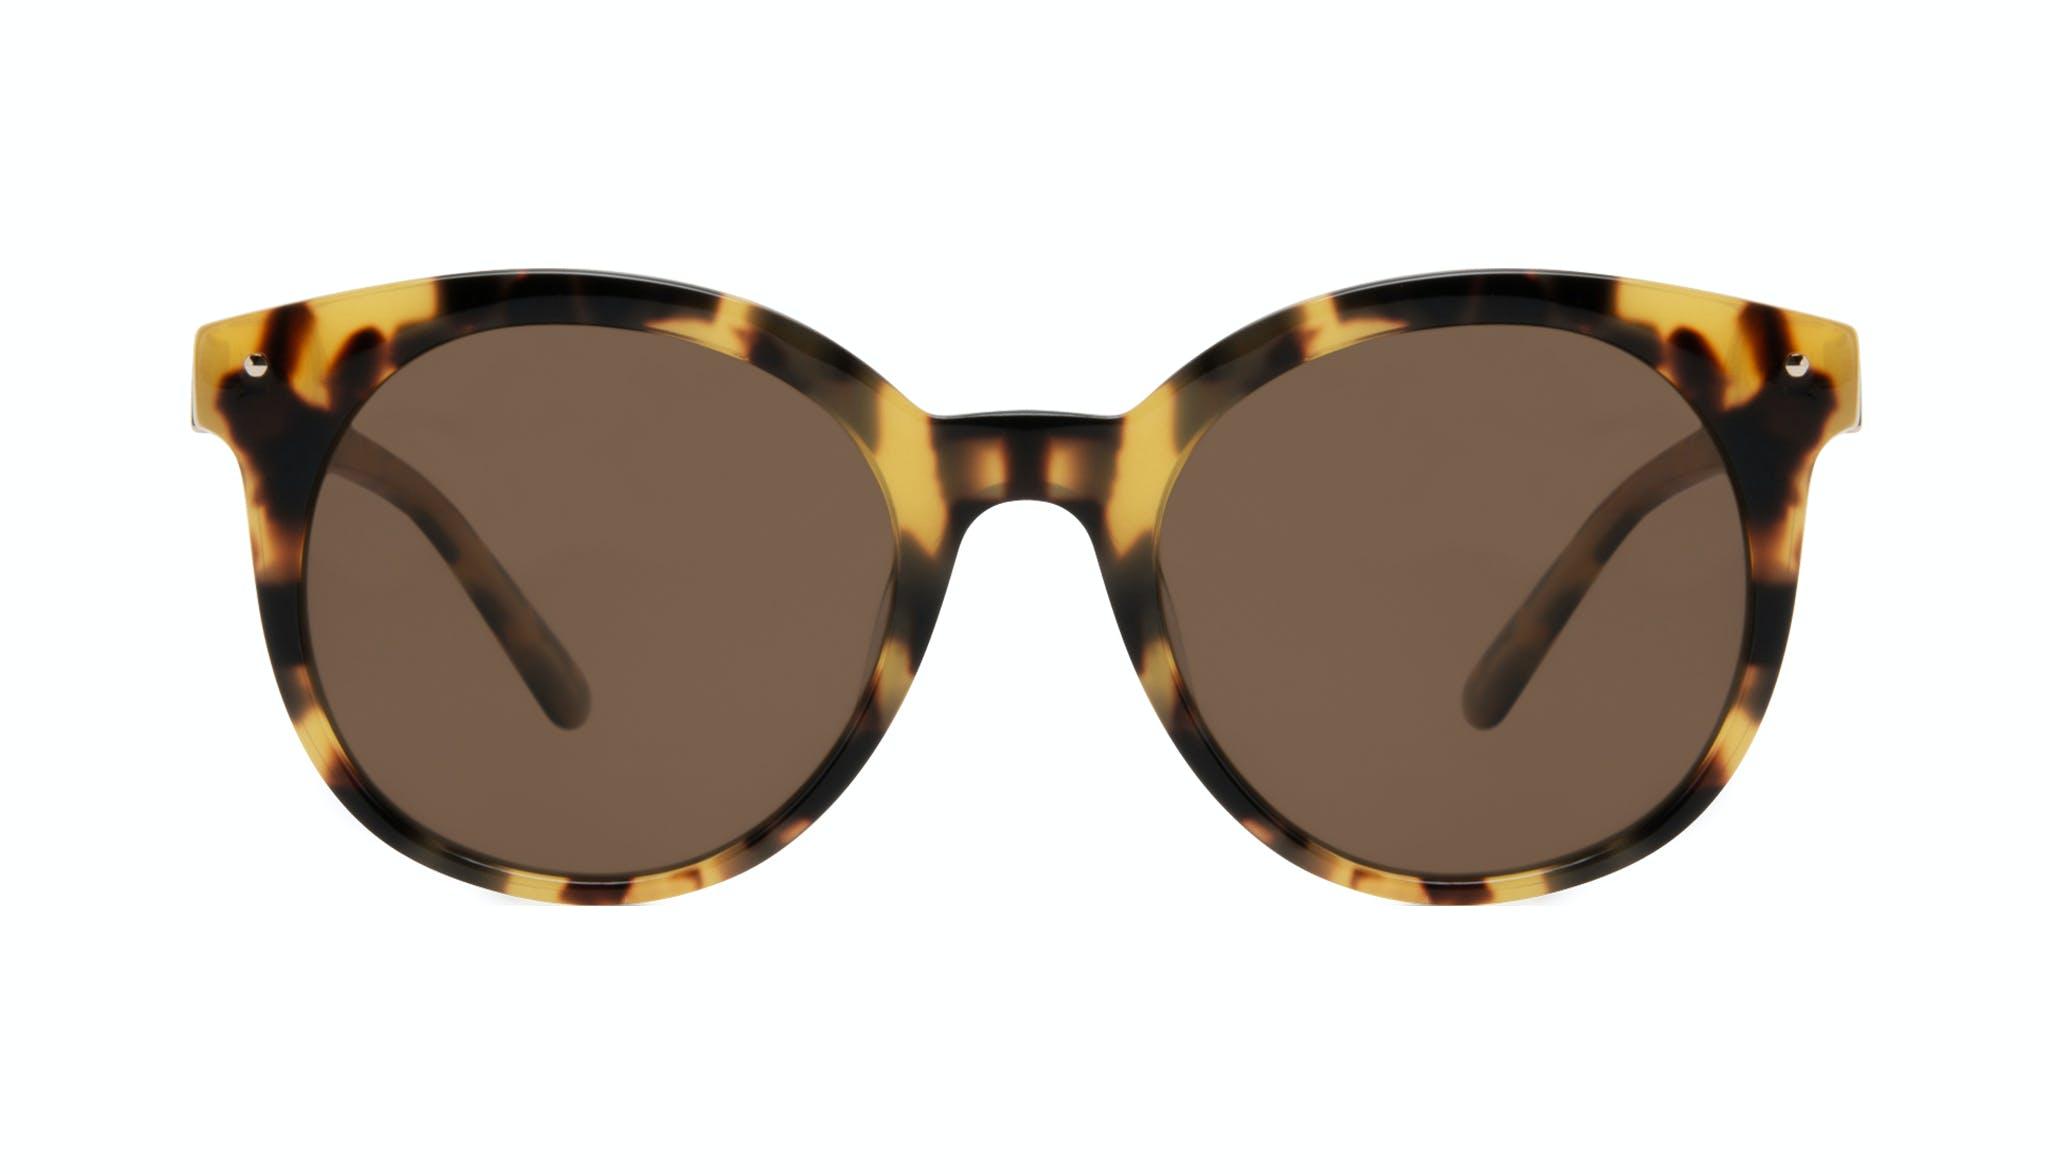 Affordable Fashion Glasses Round Sunglasses Women Hip tortoise